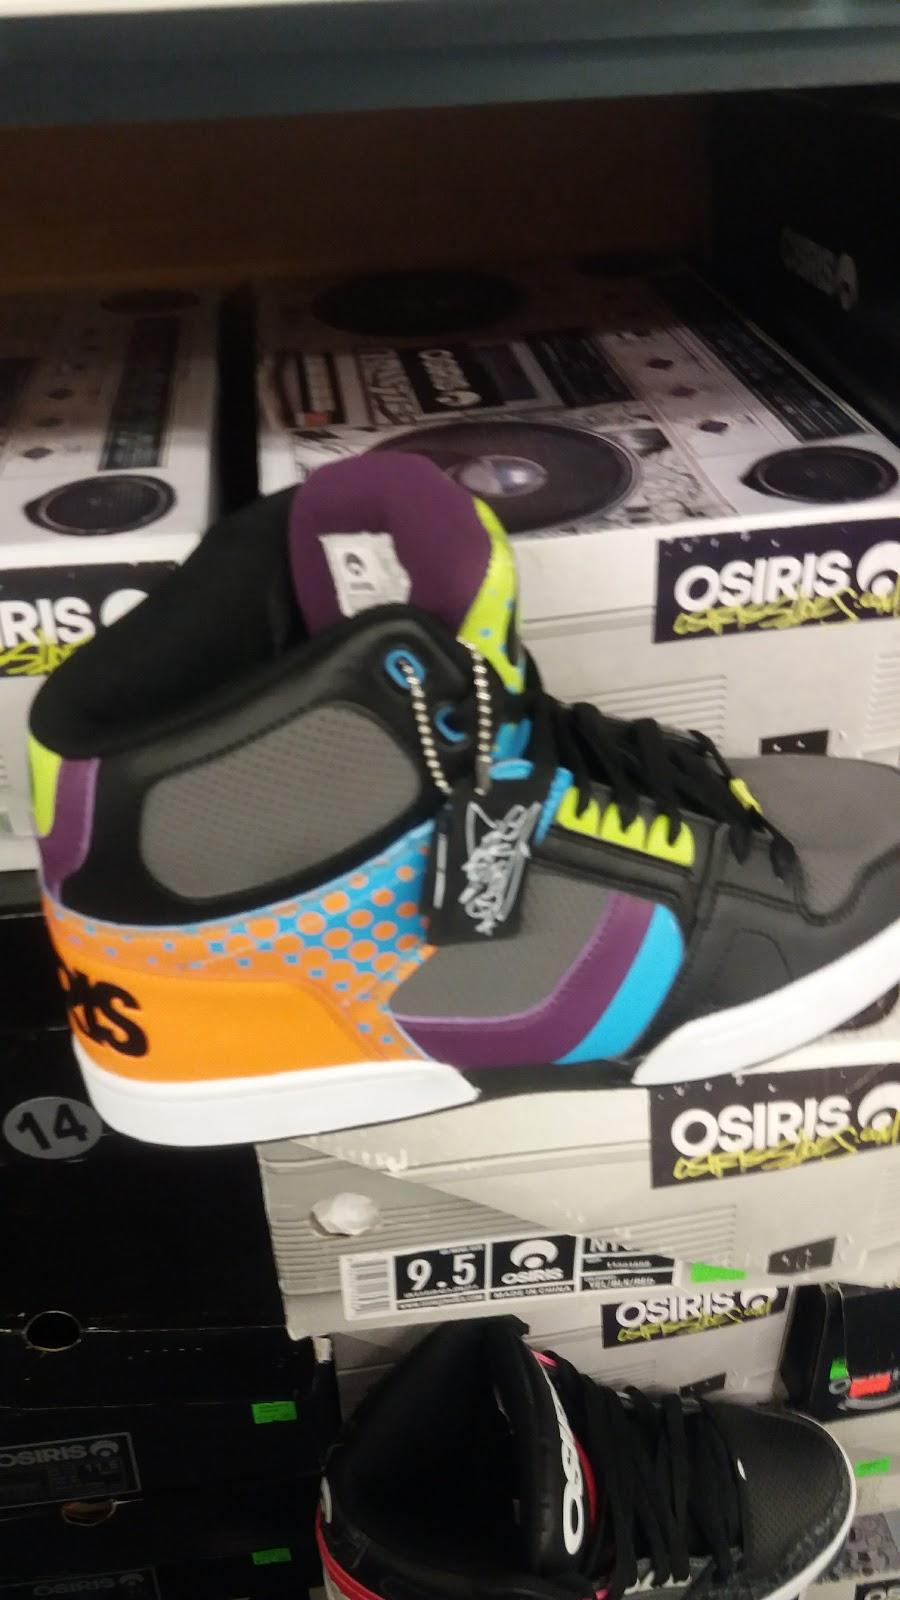 Rogans Shoes - shoe store  | Photo 6 of 10 | Address: 649 S Taylor Dr, Sheboygan, WI 53081, USA | Phone: (920) 451-0188